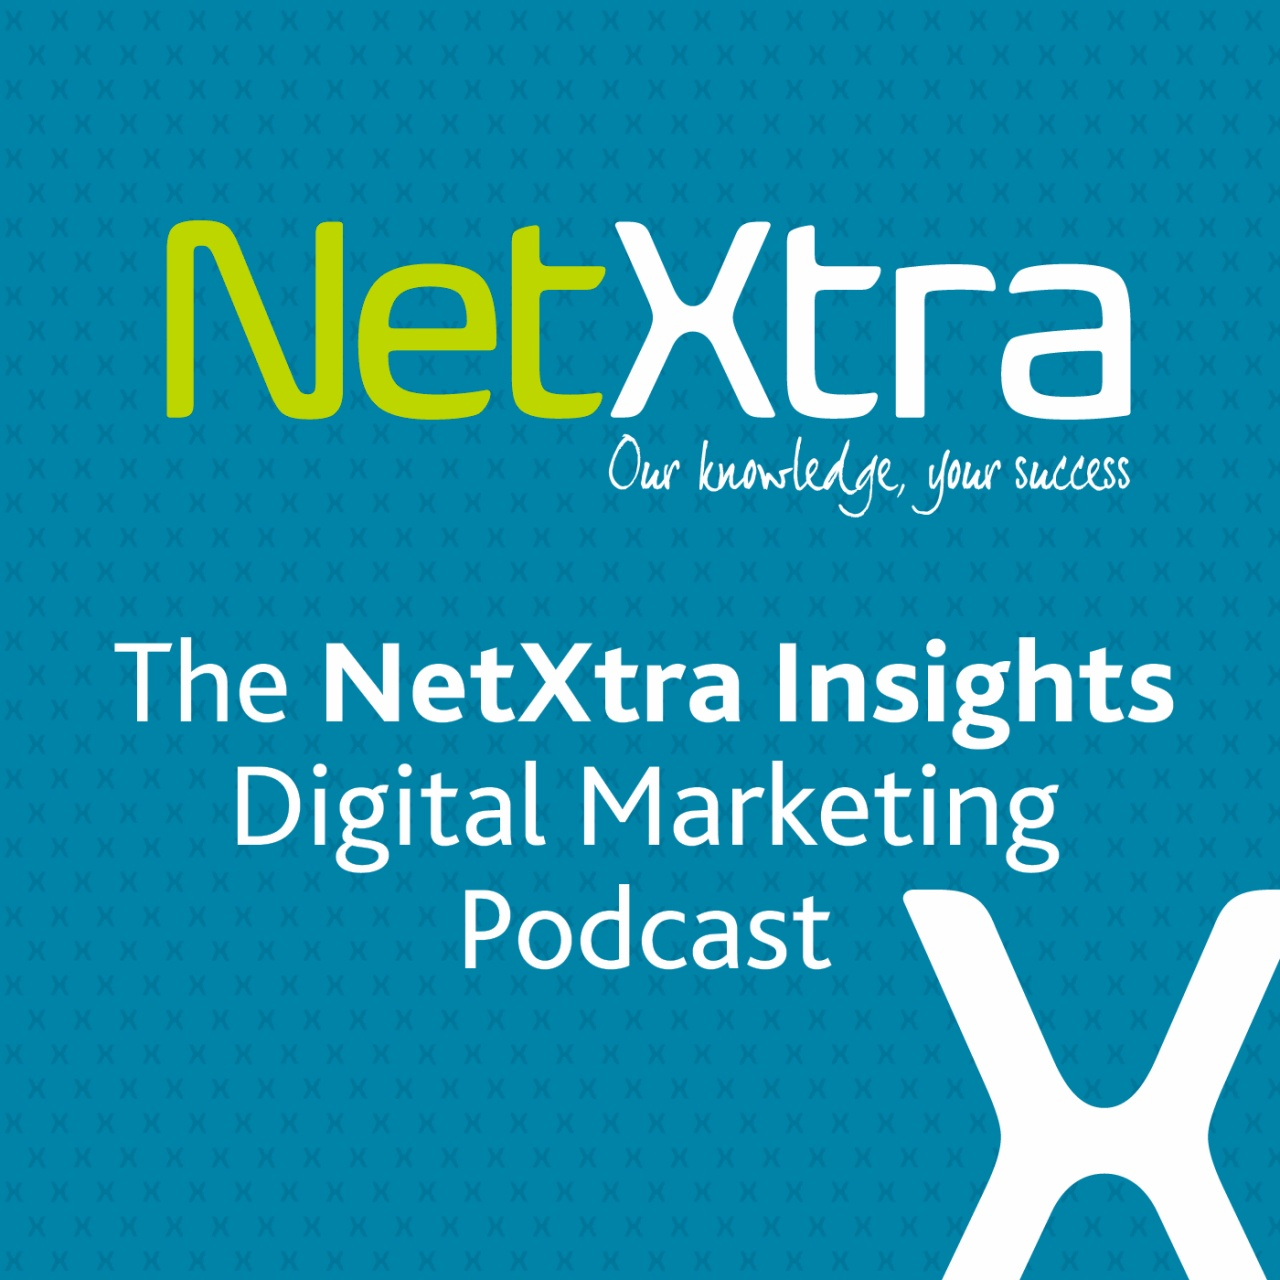 NetXtra